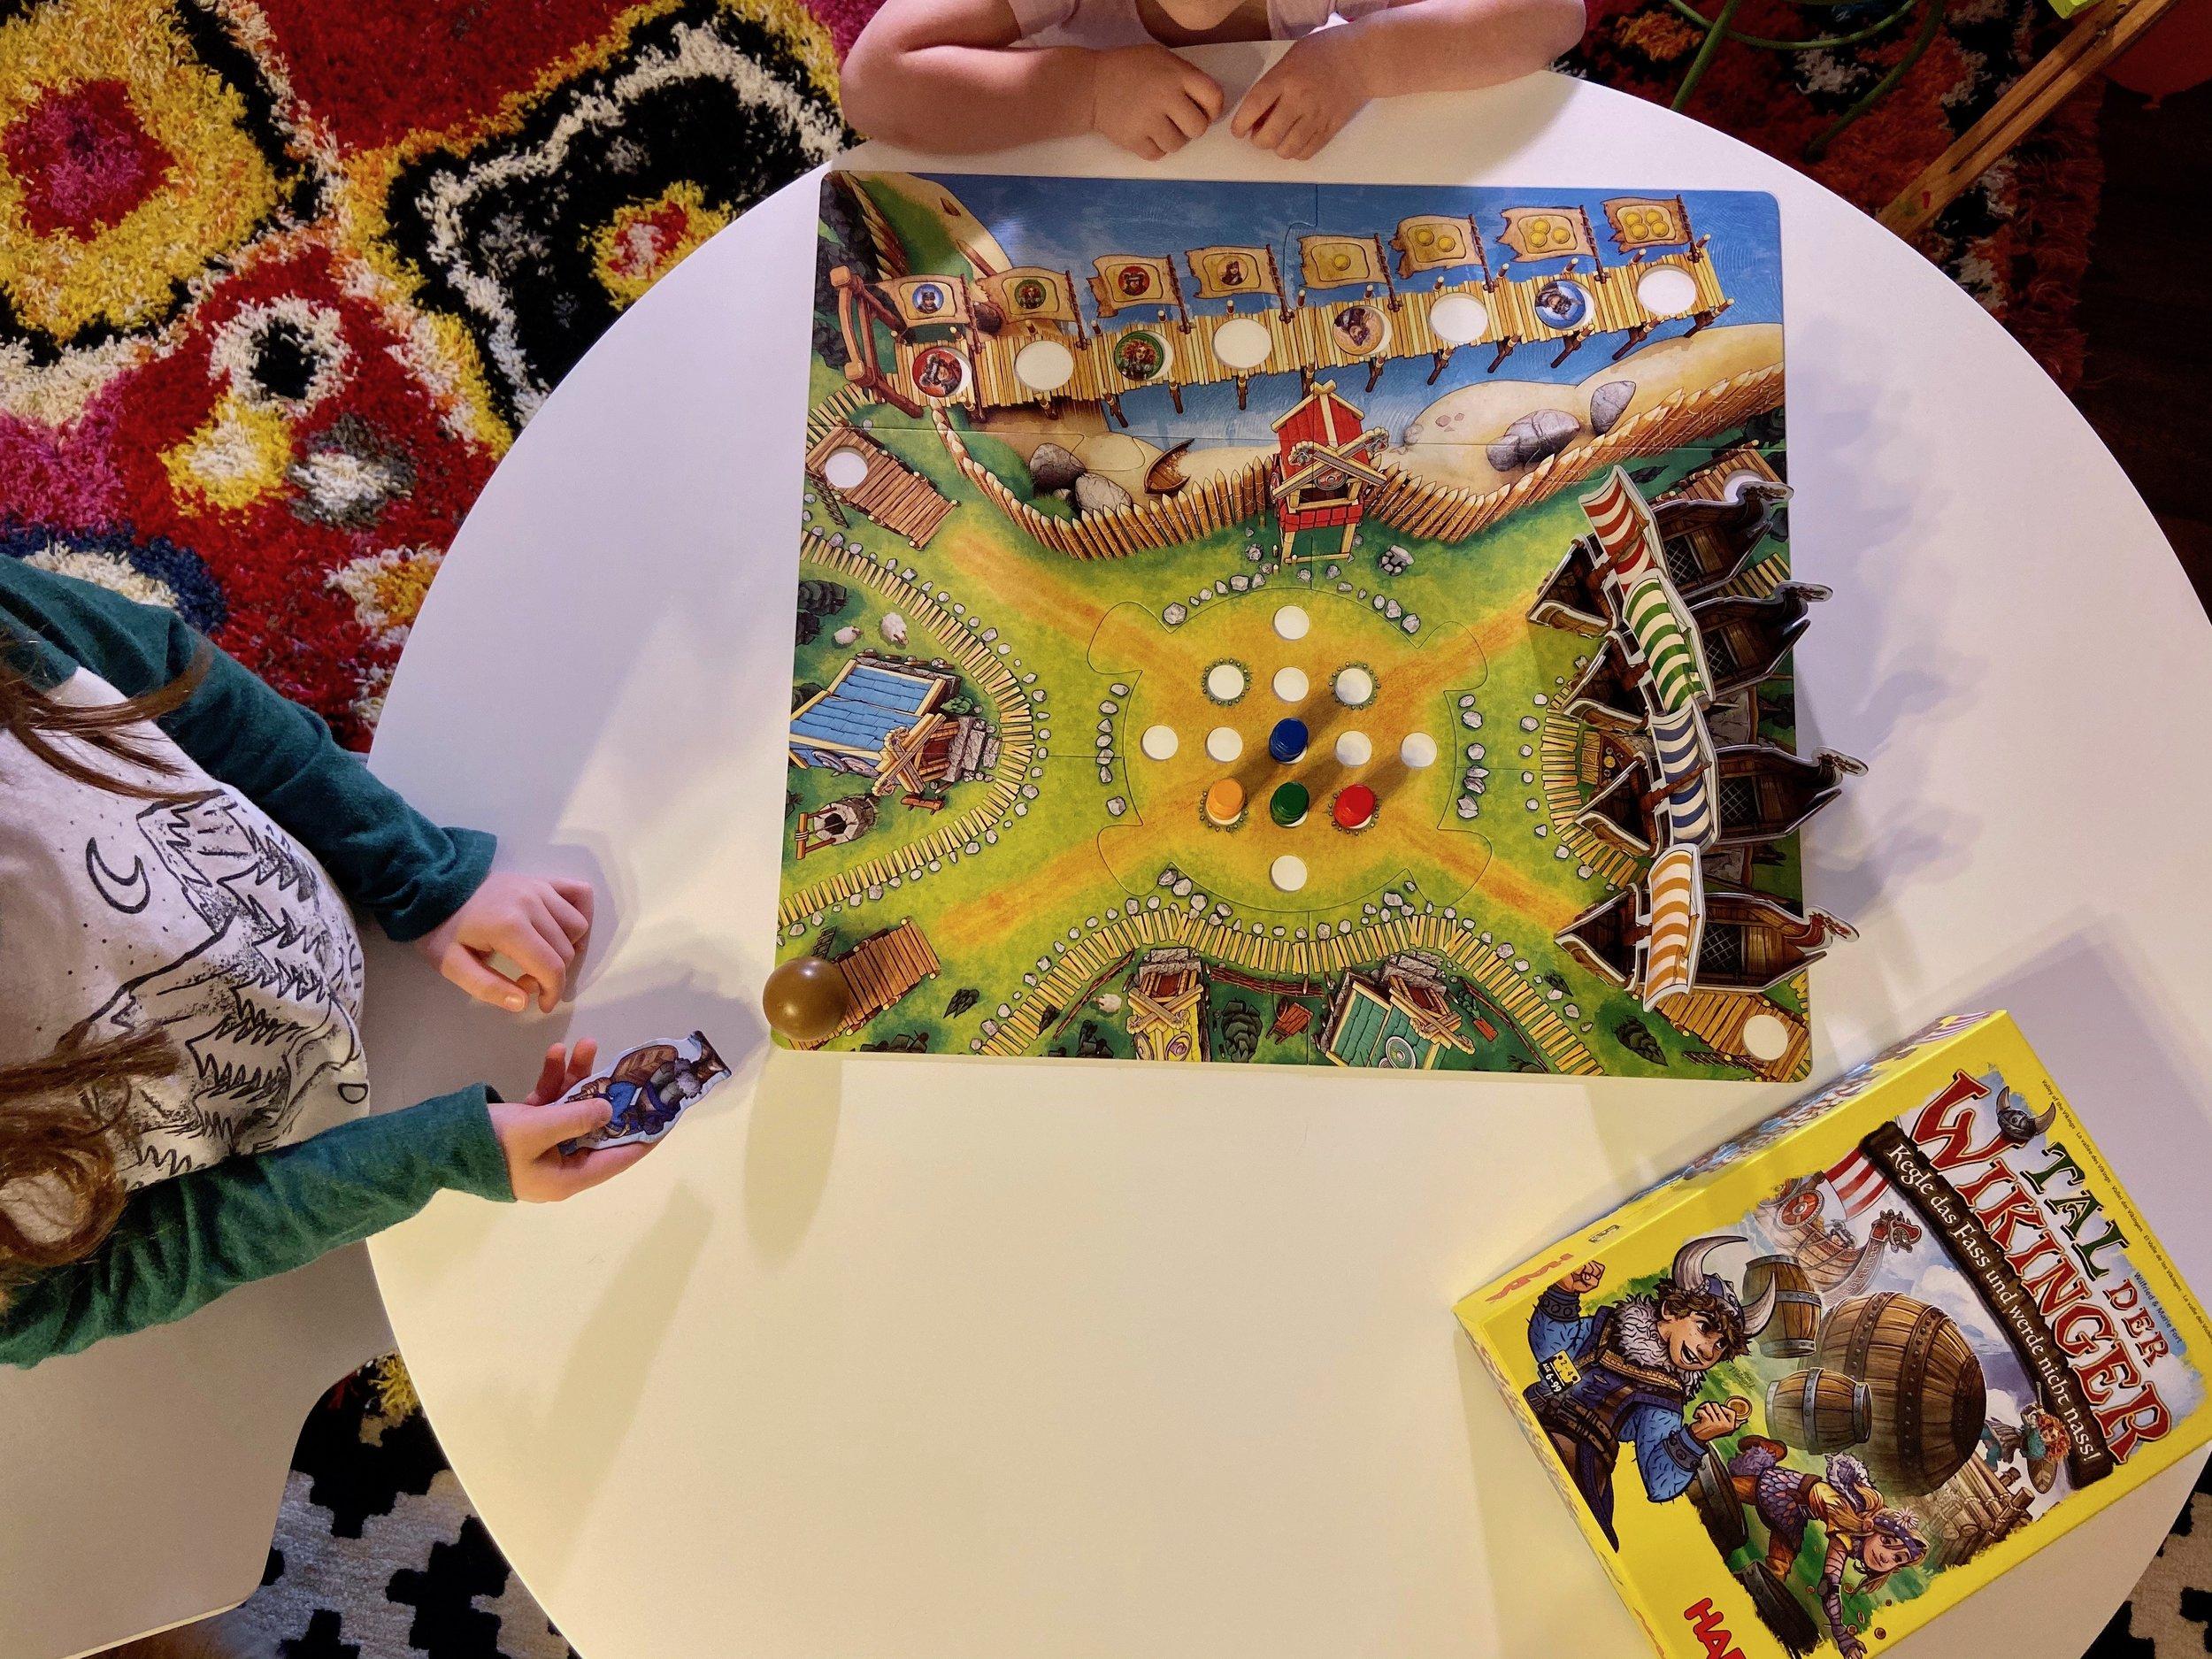 valley of the vikings HABA kids board game 5.jpeg